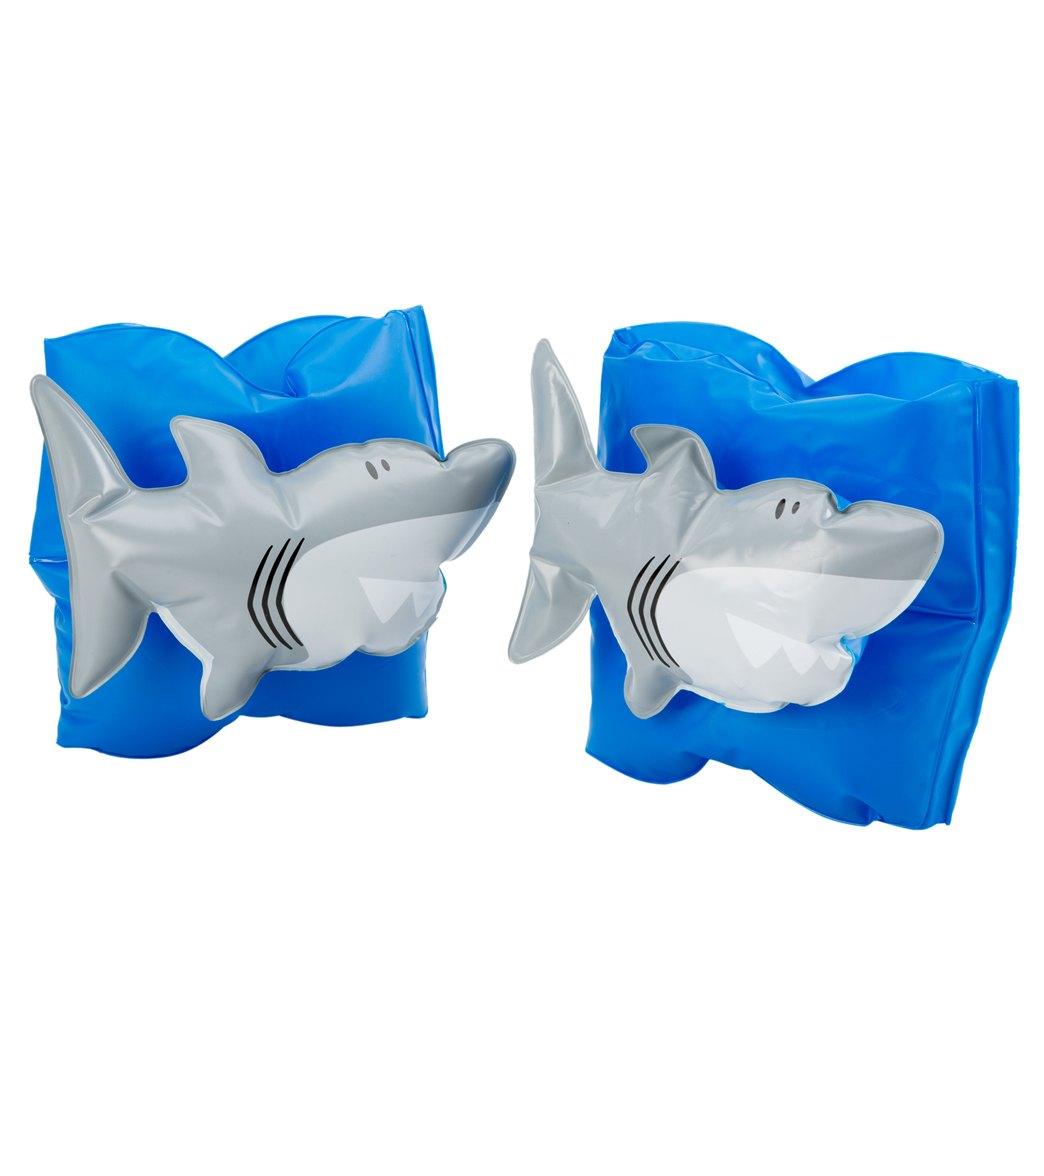 91384664142 Stephen Joseph Shark Water Wings (3yrs-6yrs) at SwimOutlet.com